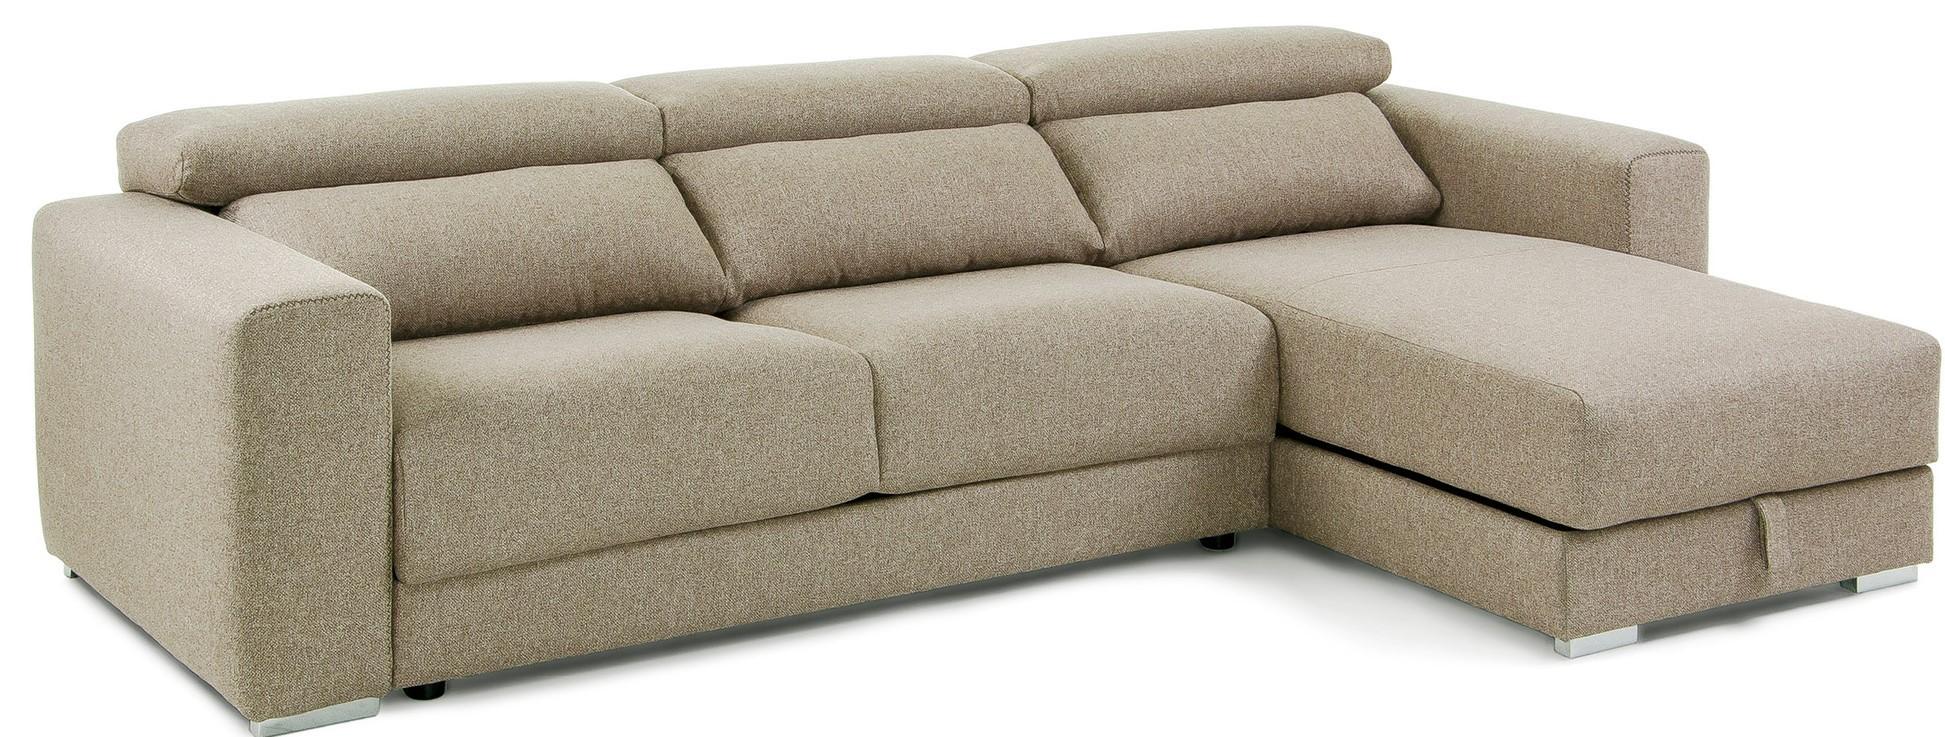 Takian Sofá 3 Plazas + Chaise Lounge Beige